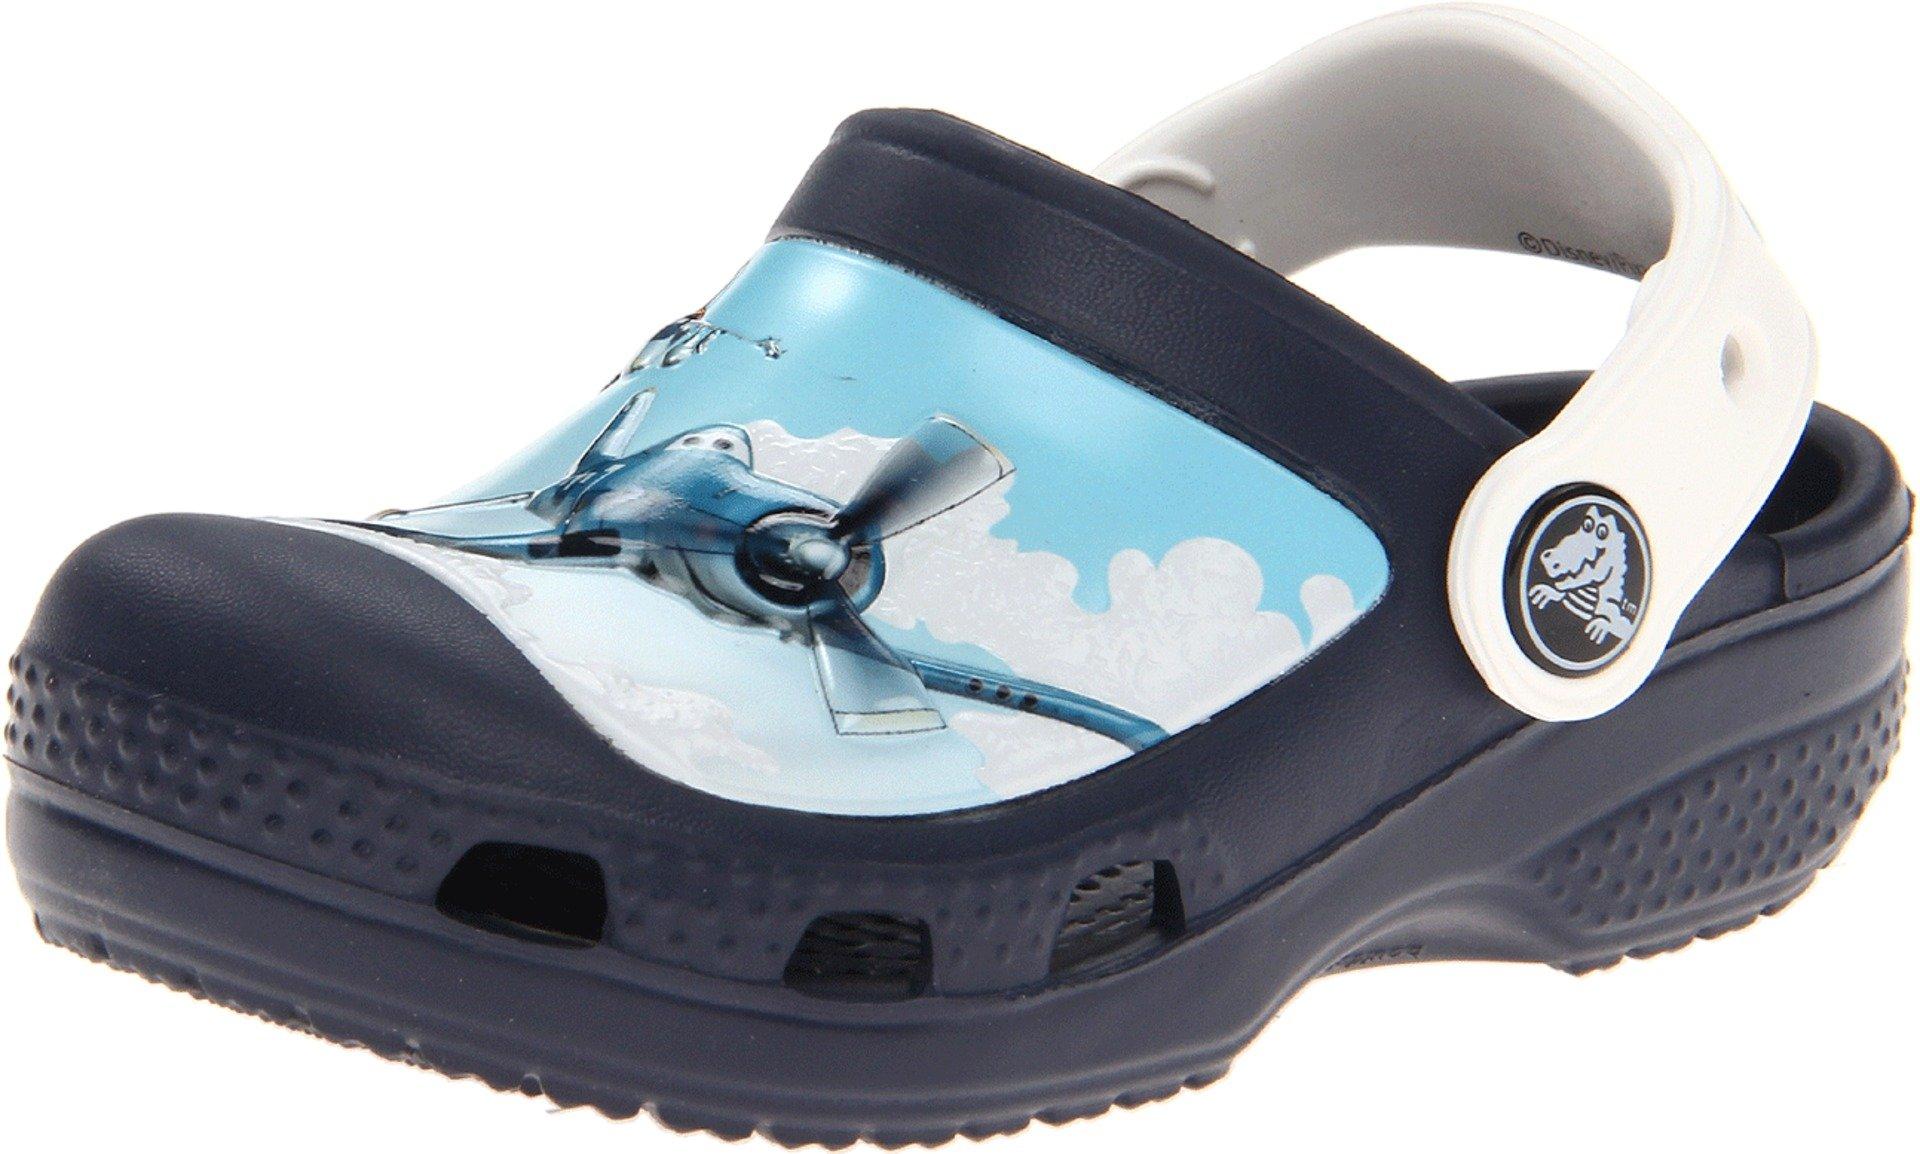 Crocs 15343 CC Planes Clog (Toddler/Little Kid),Navy,4 M US Toddler